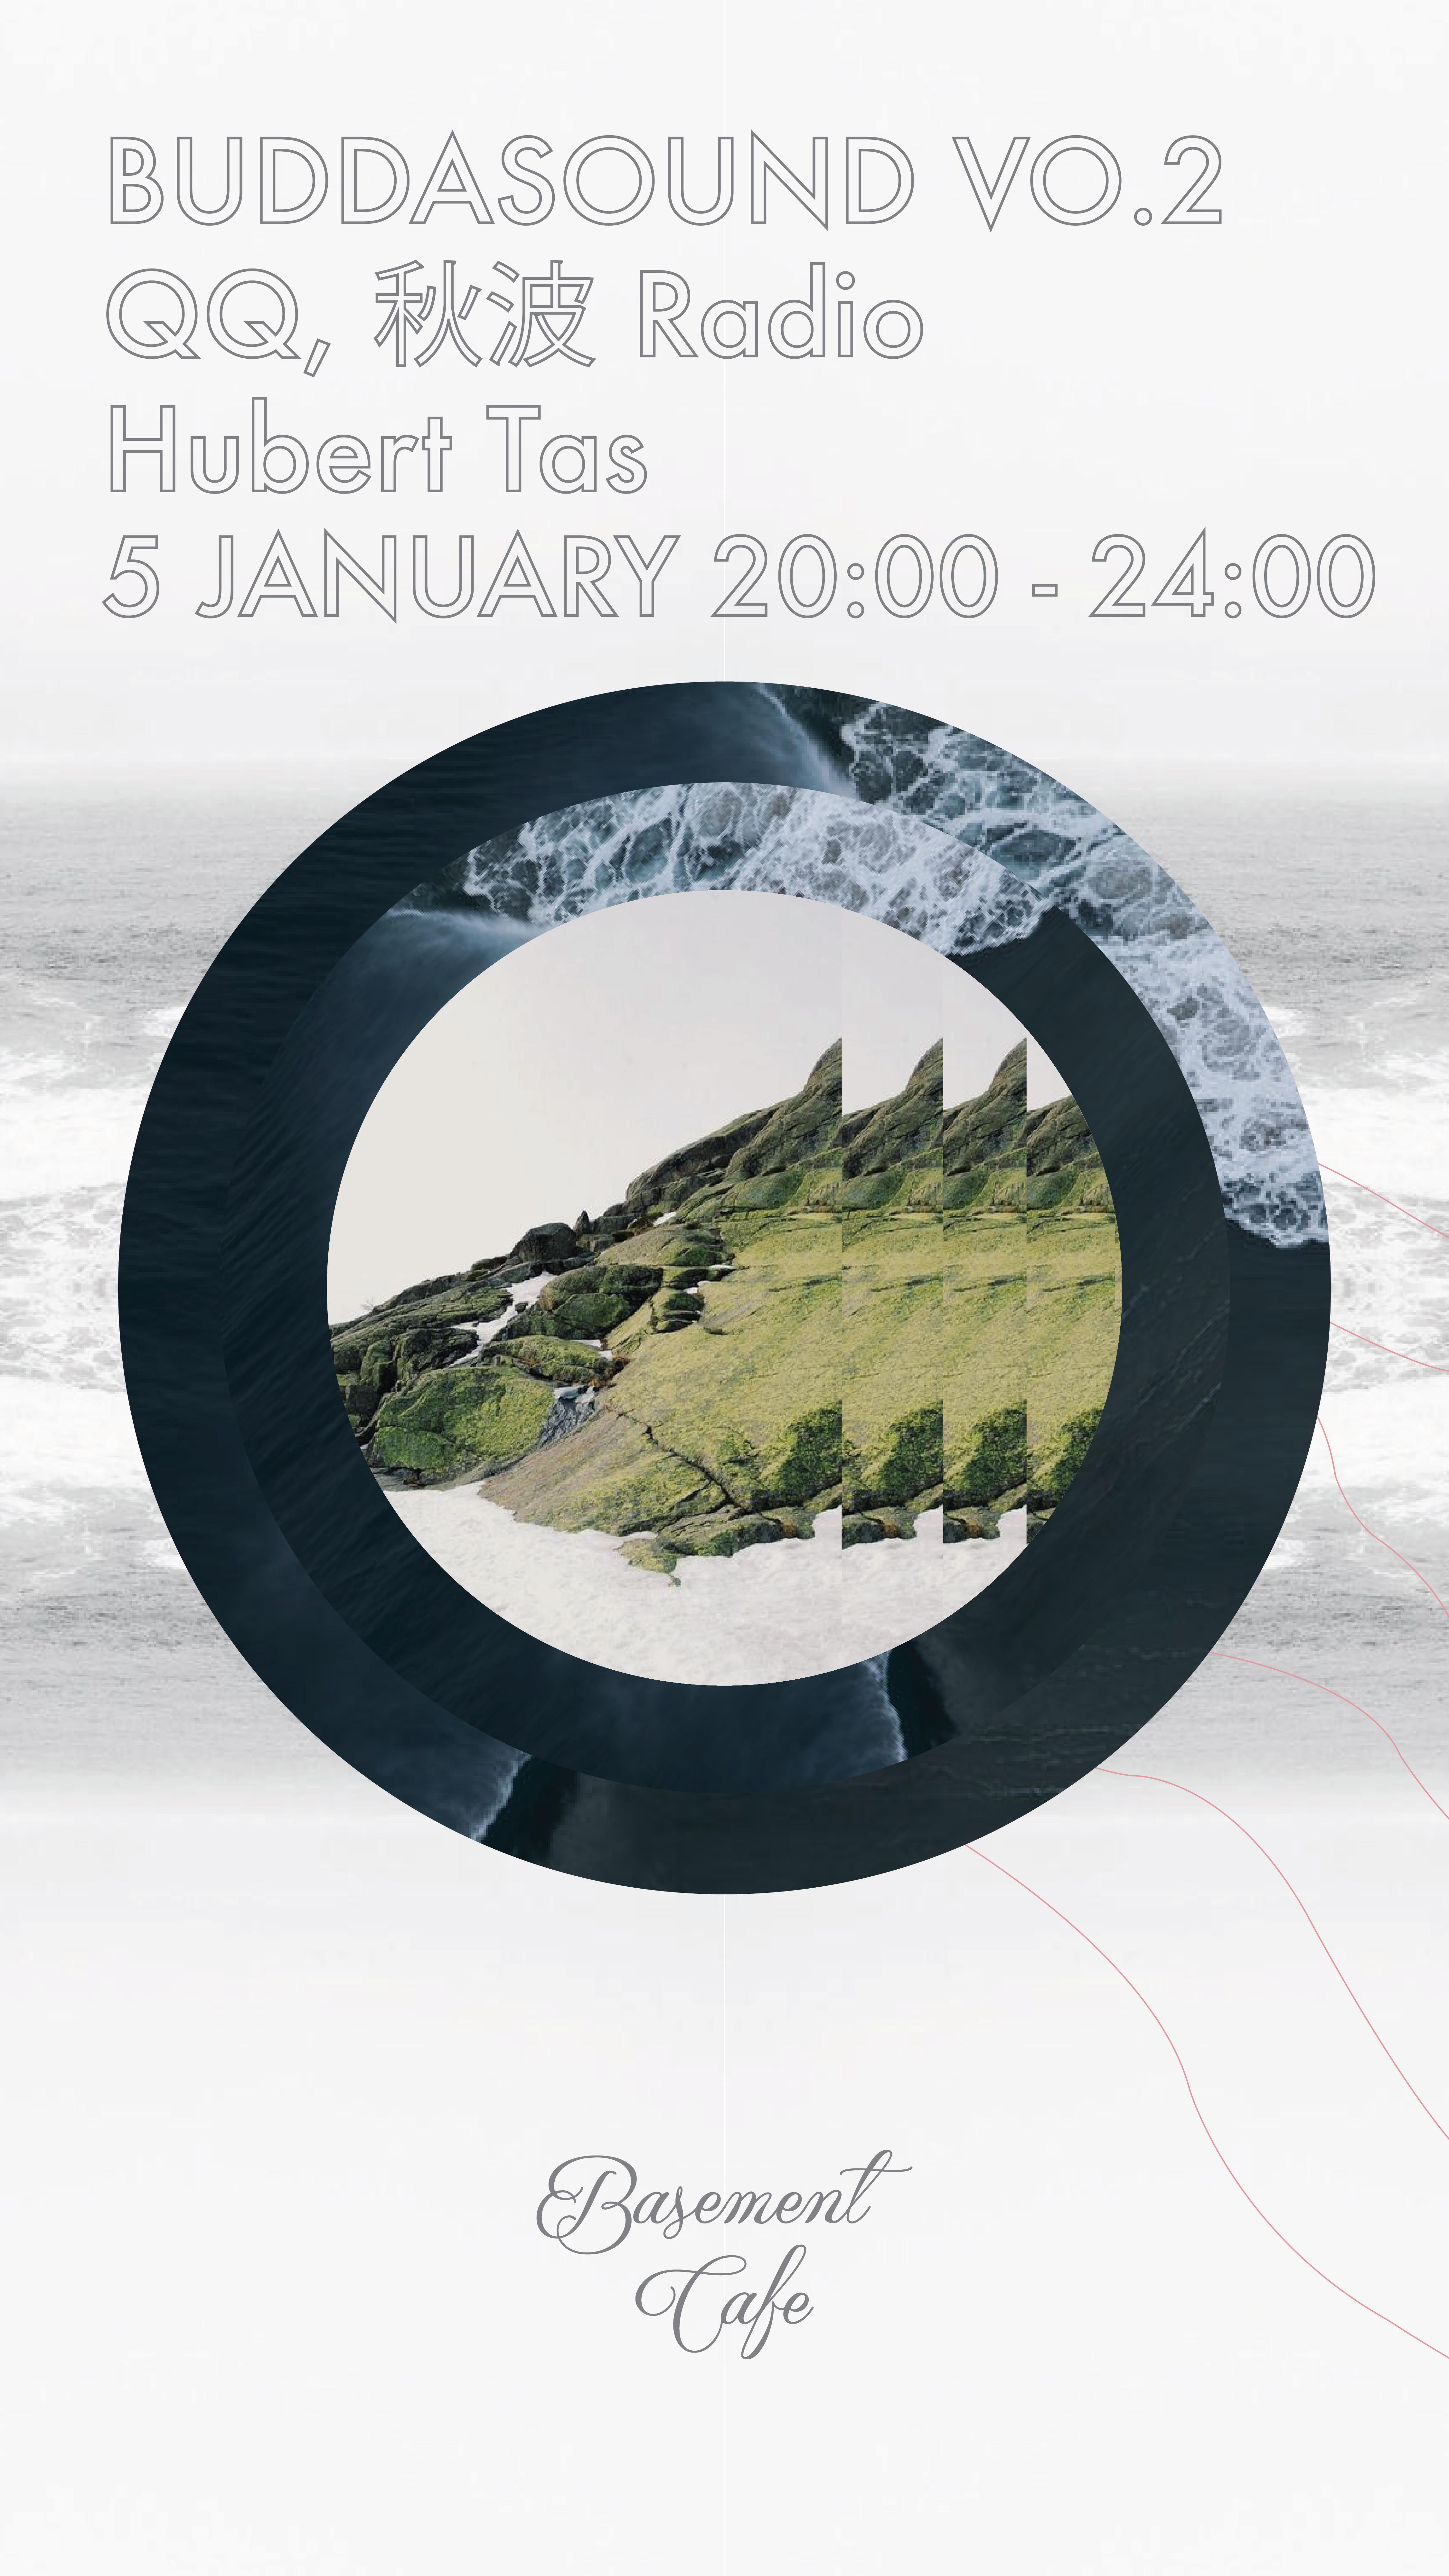 Buddasound Vo 2 Event Poster Design Event Poster Poster Design